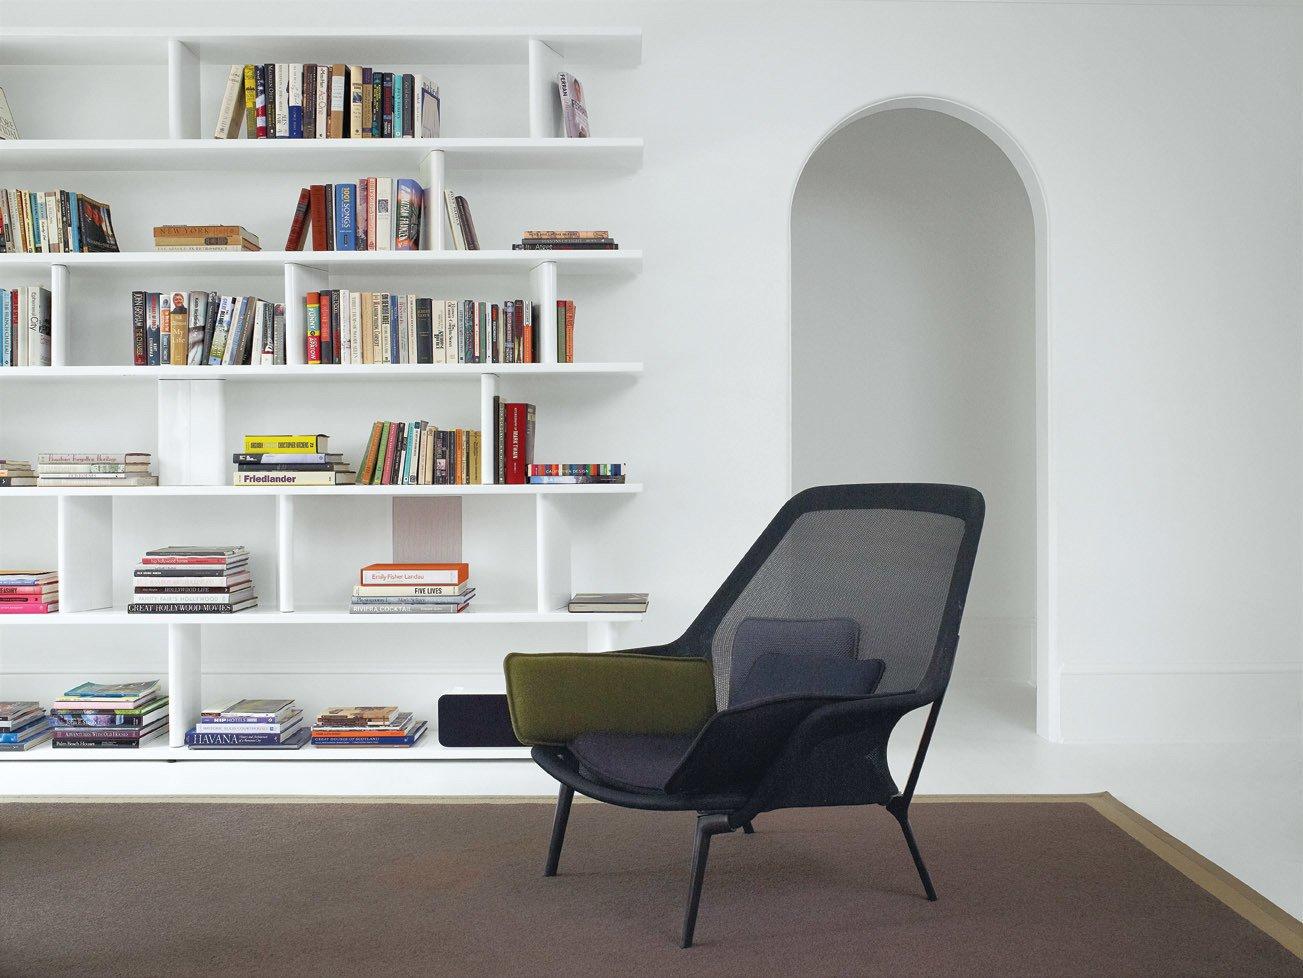 #seatingdesign #Slowchair #steel #bookcase #powder-coated #minimal #aesthetic #HillRenovation #BarbaraHill  100+ Best Modern Seating Designs